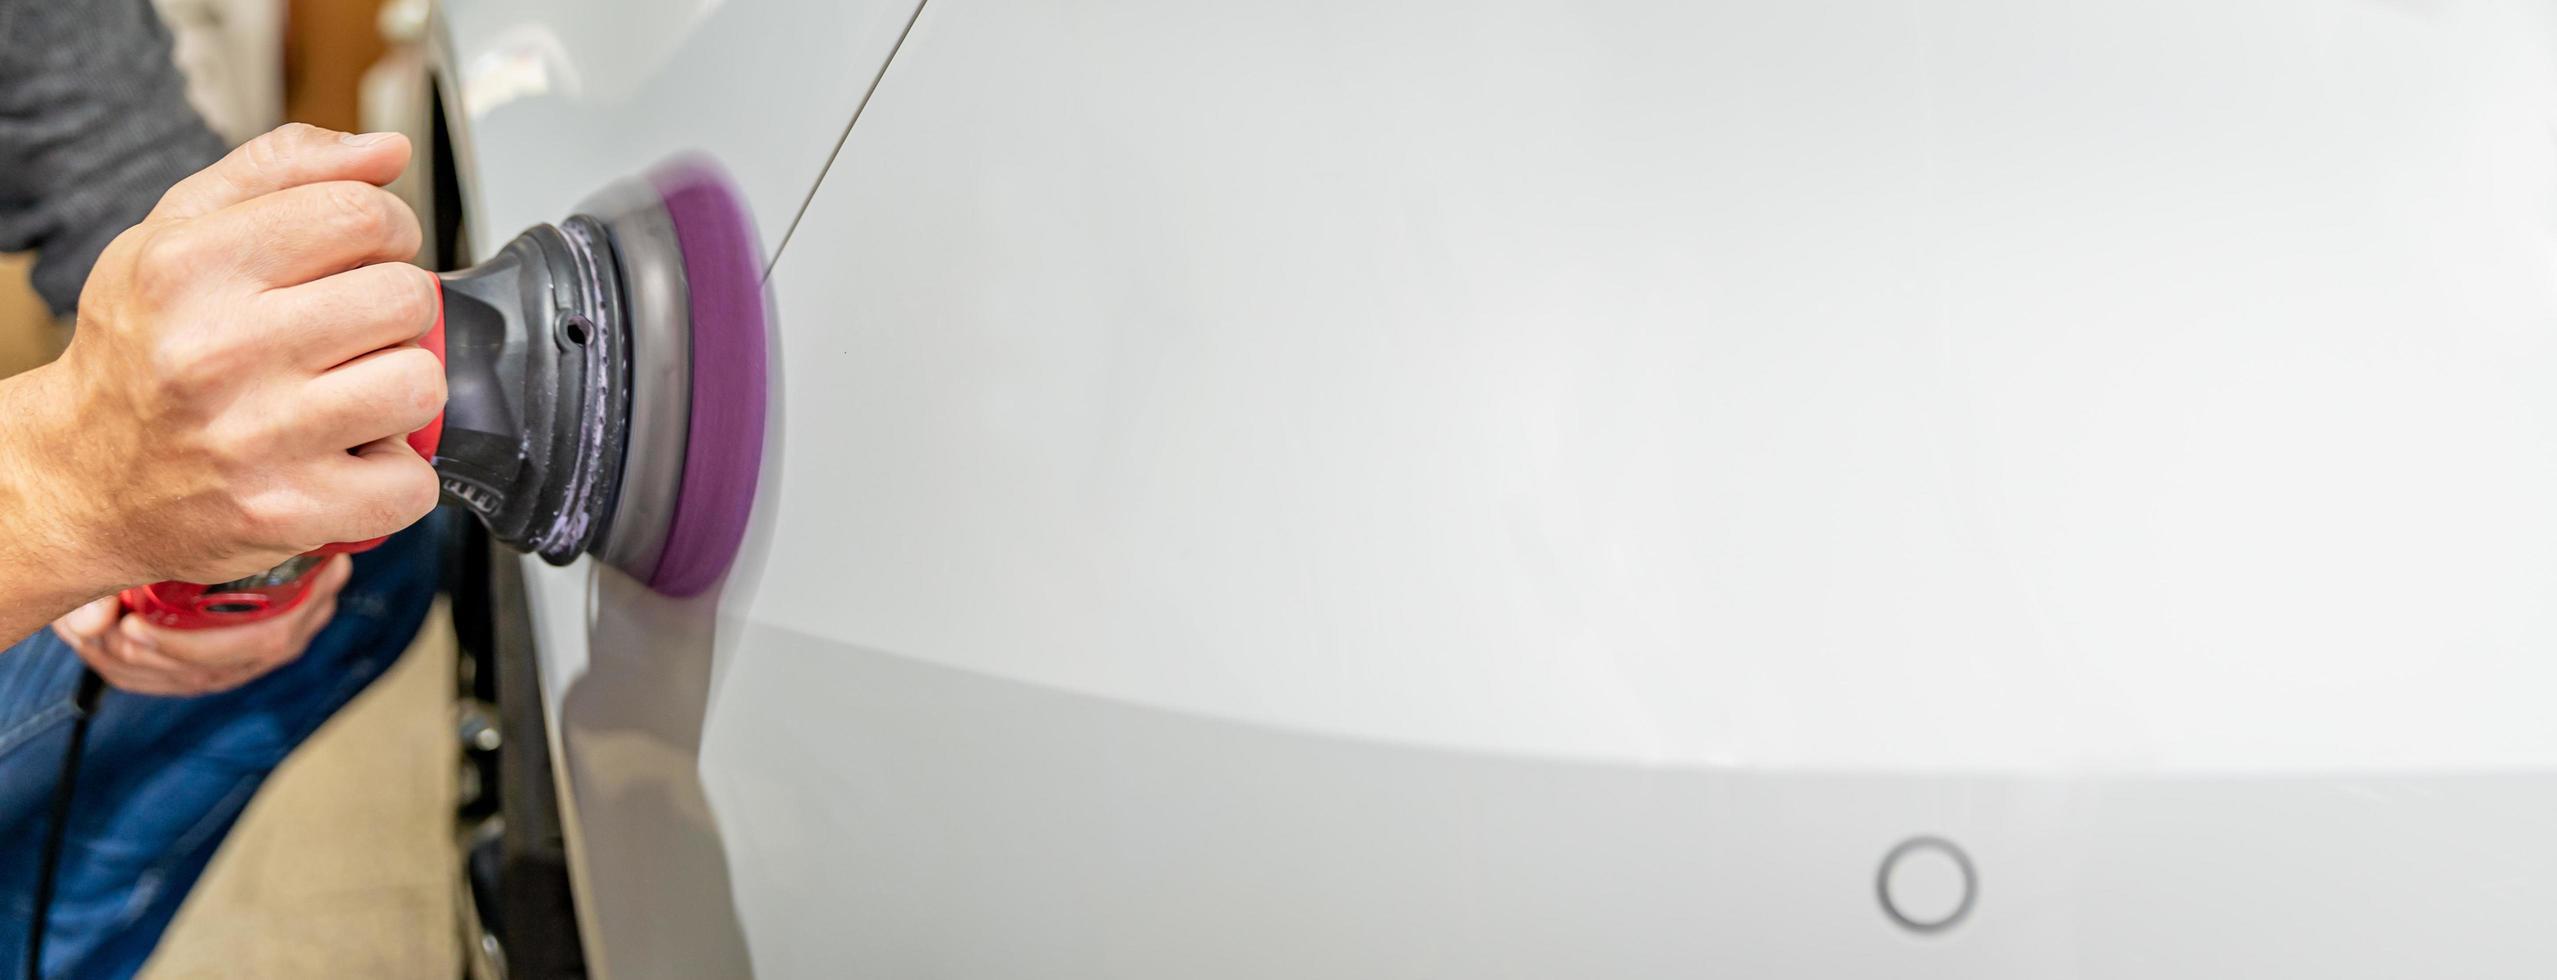 Car body repair polishing photo